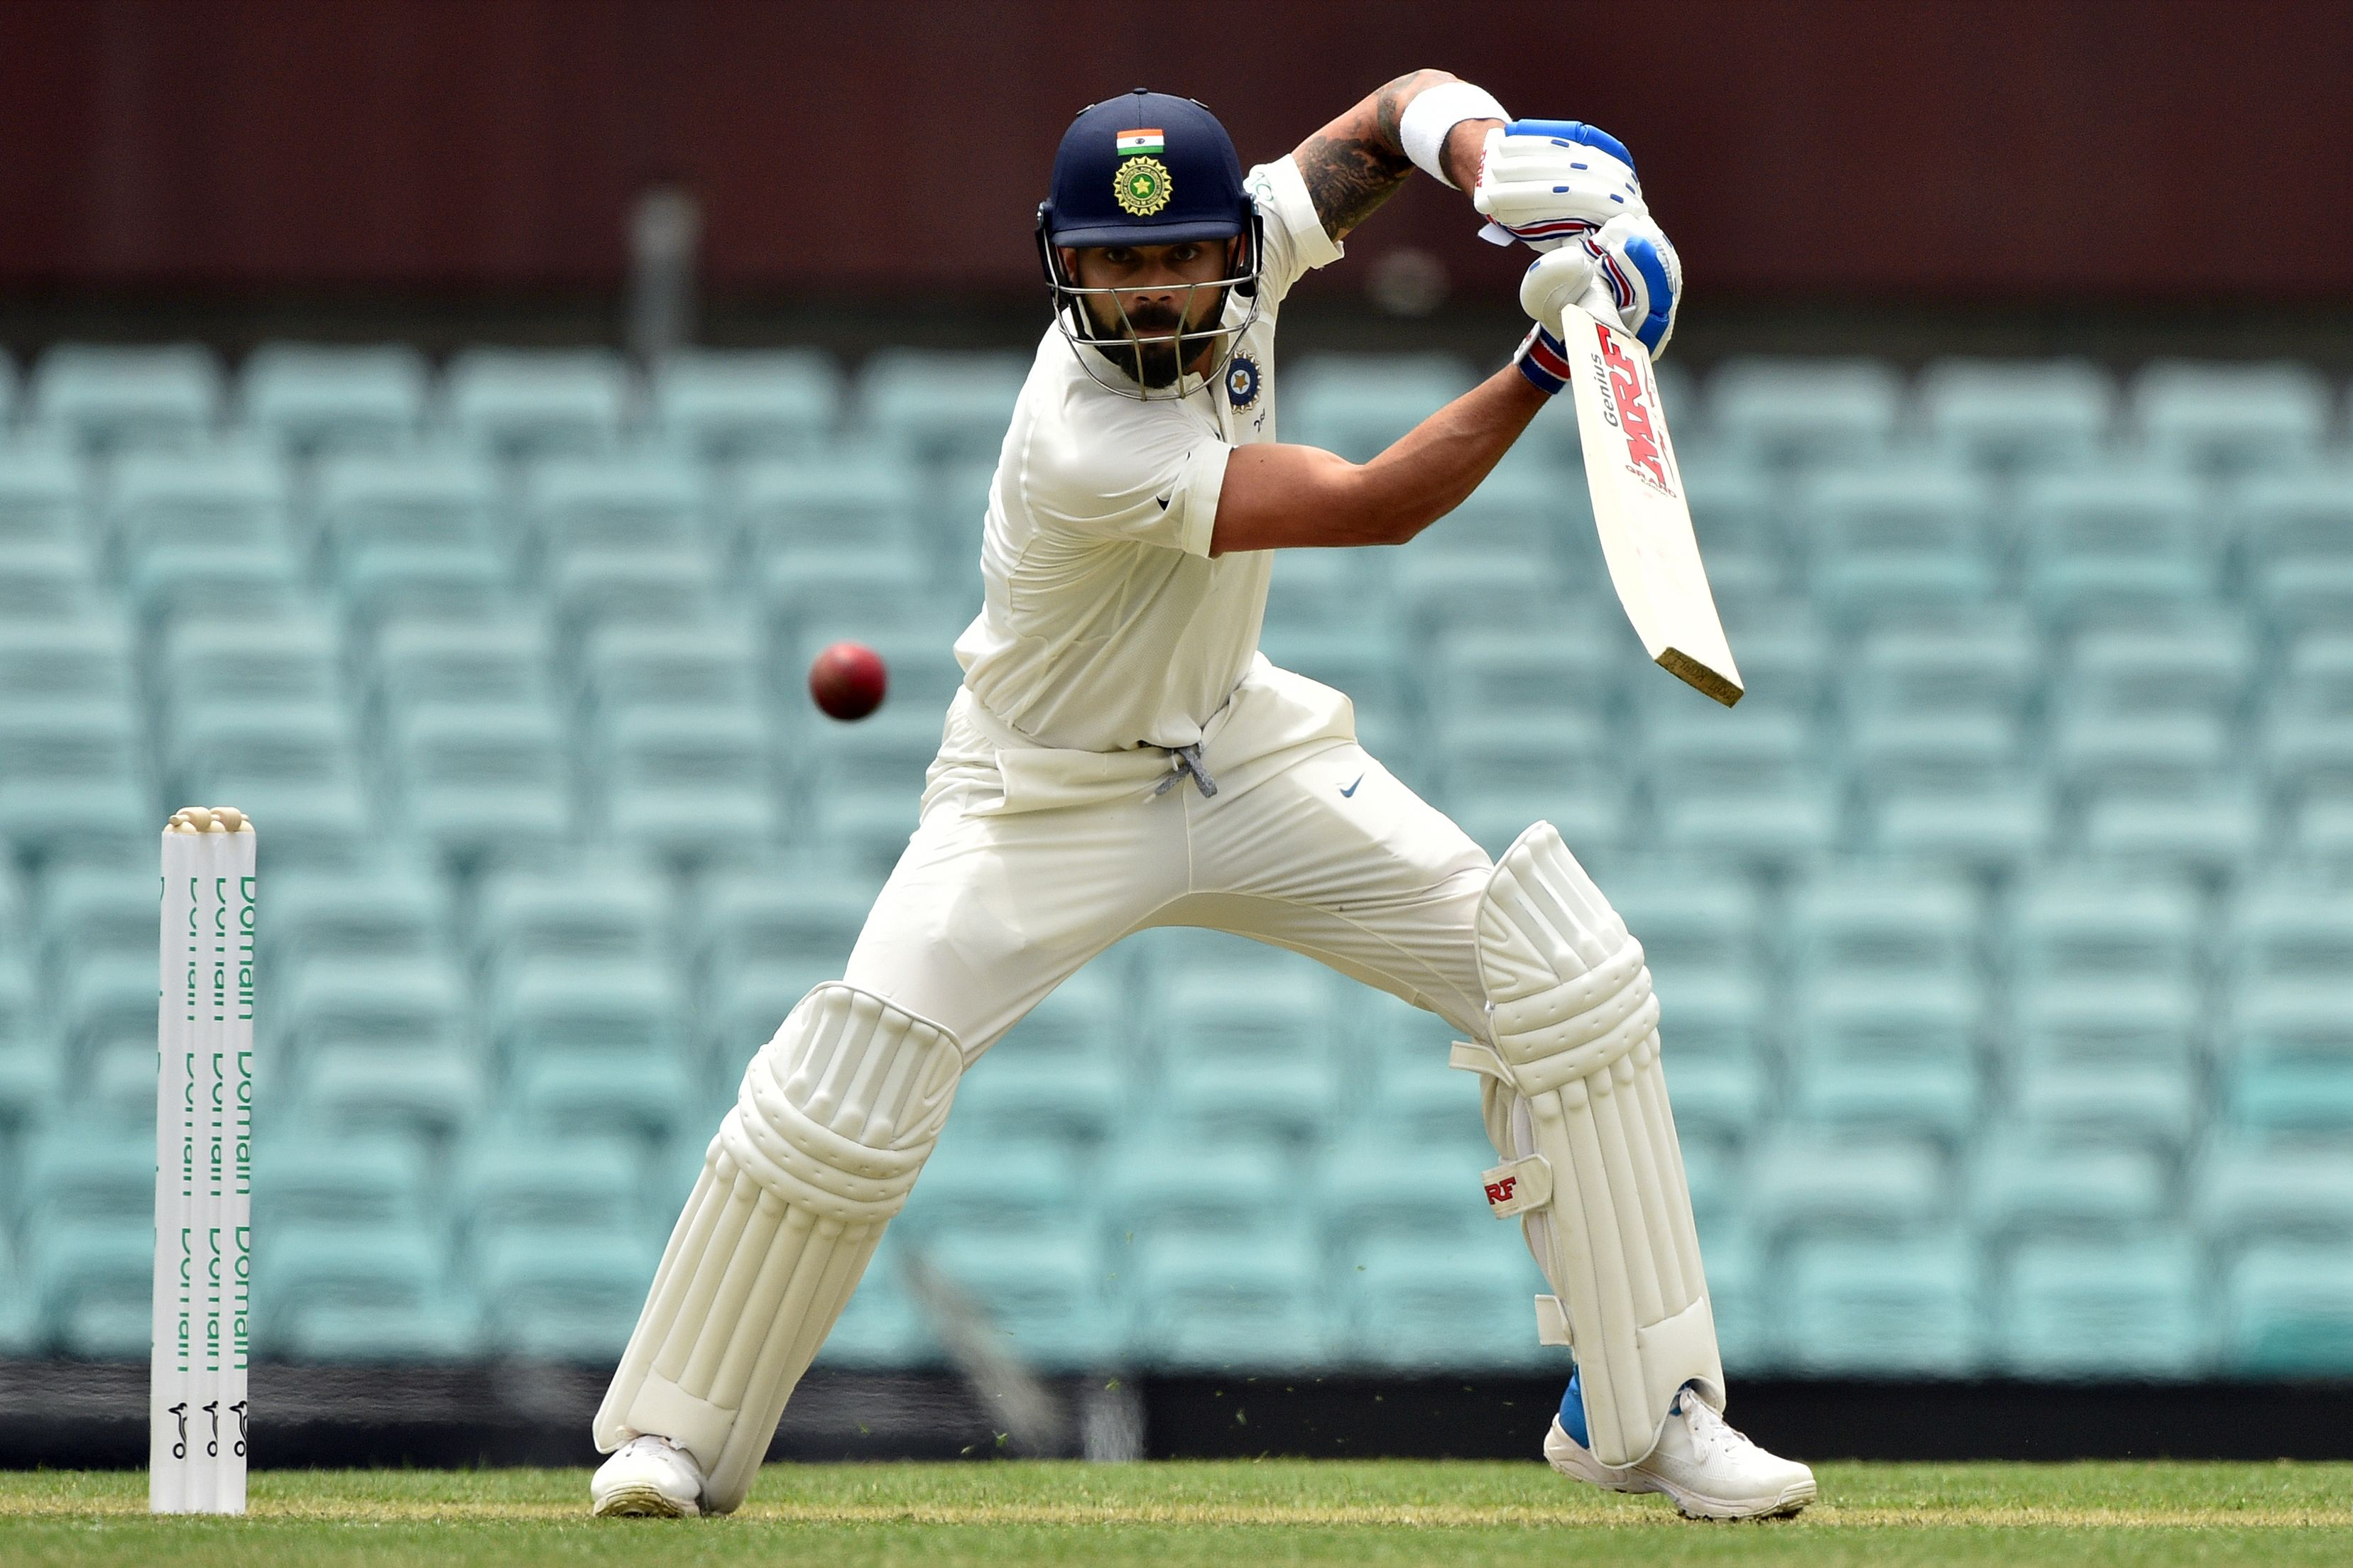 sports news, Cricket news in hindi, ind vs aus, test series, former player, sunil gavaskar, team india, top oder, flop, captain virat kohli